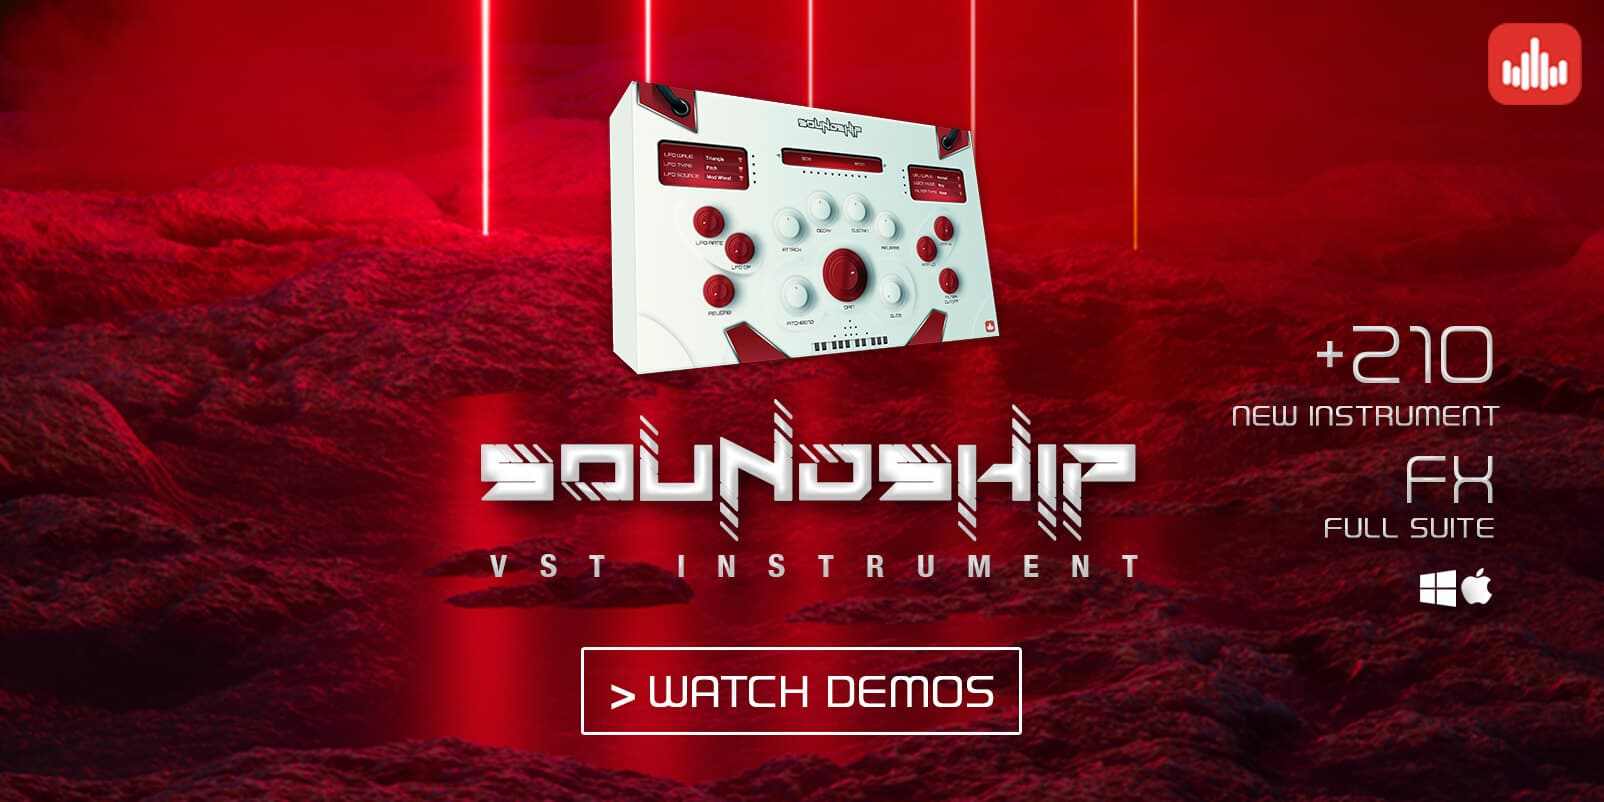 ProducerSources - Download Loops, Drum kits, VST Plugins